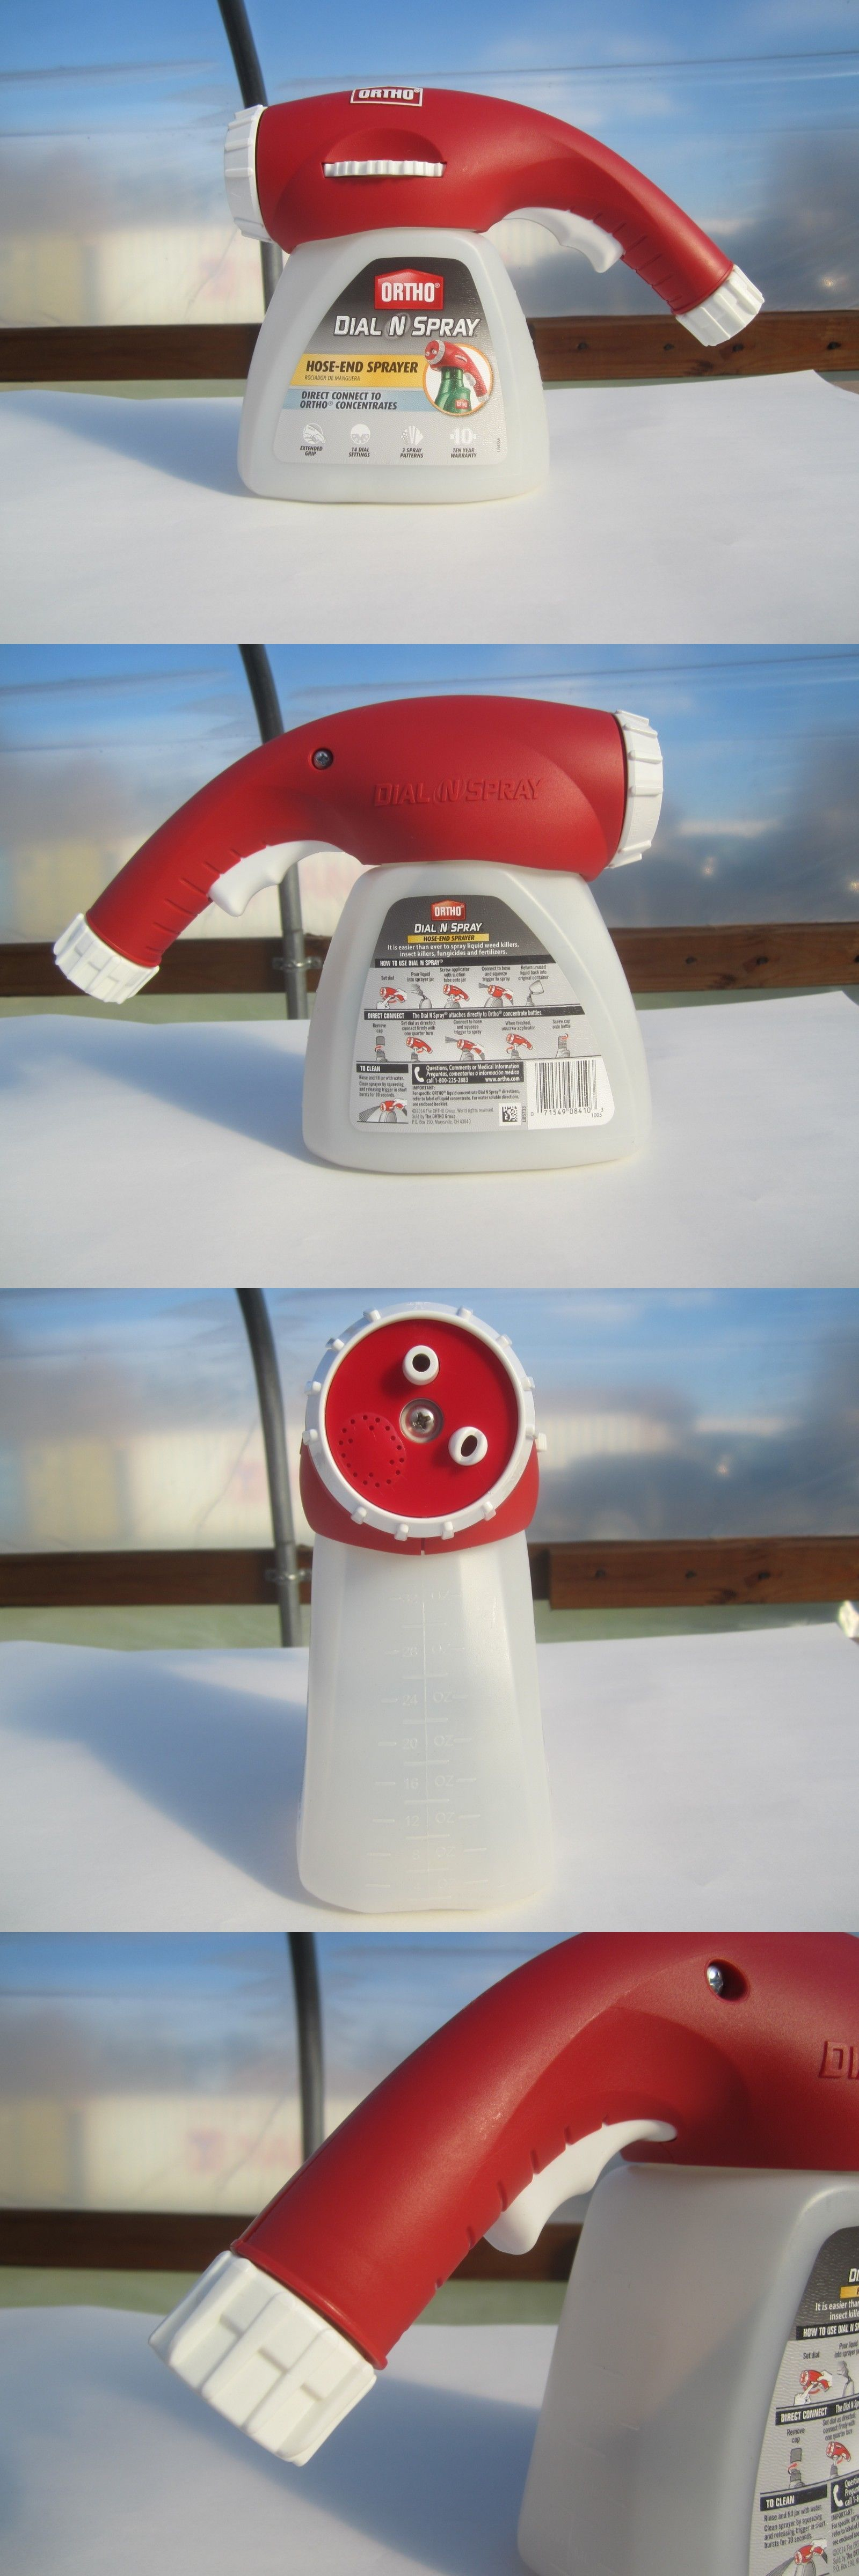 Garden Sprayers 178984: Free Shipping, New Ortho Dial N Spray Multi